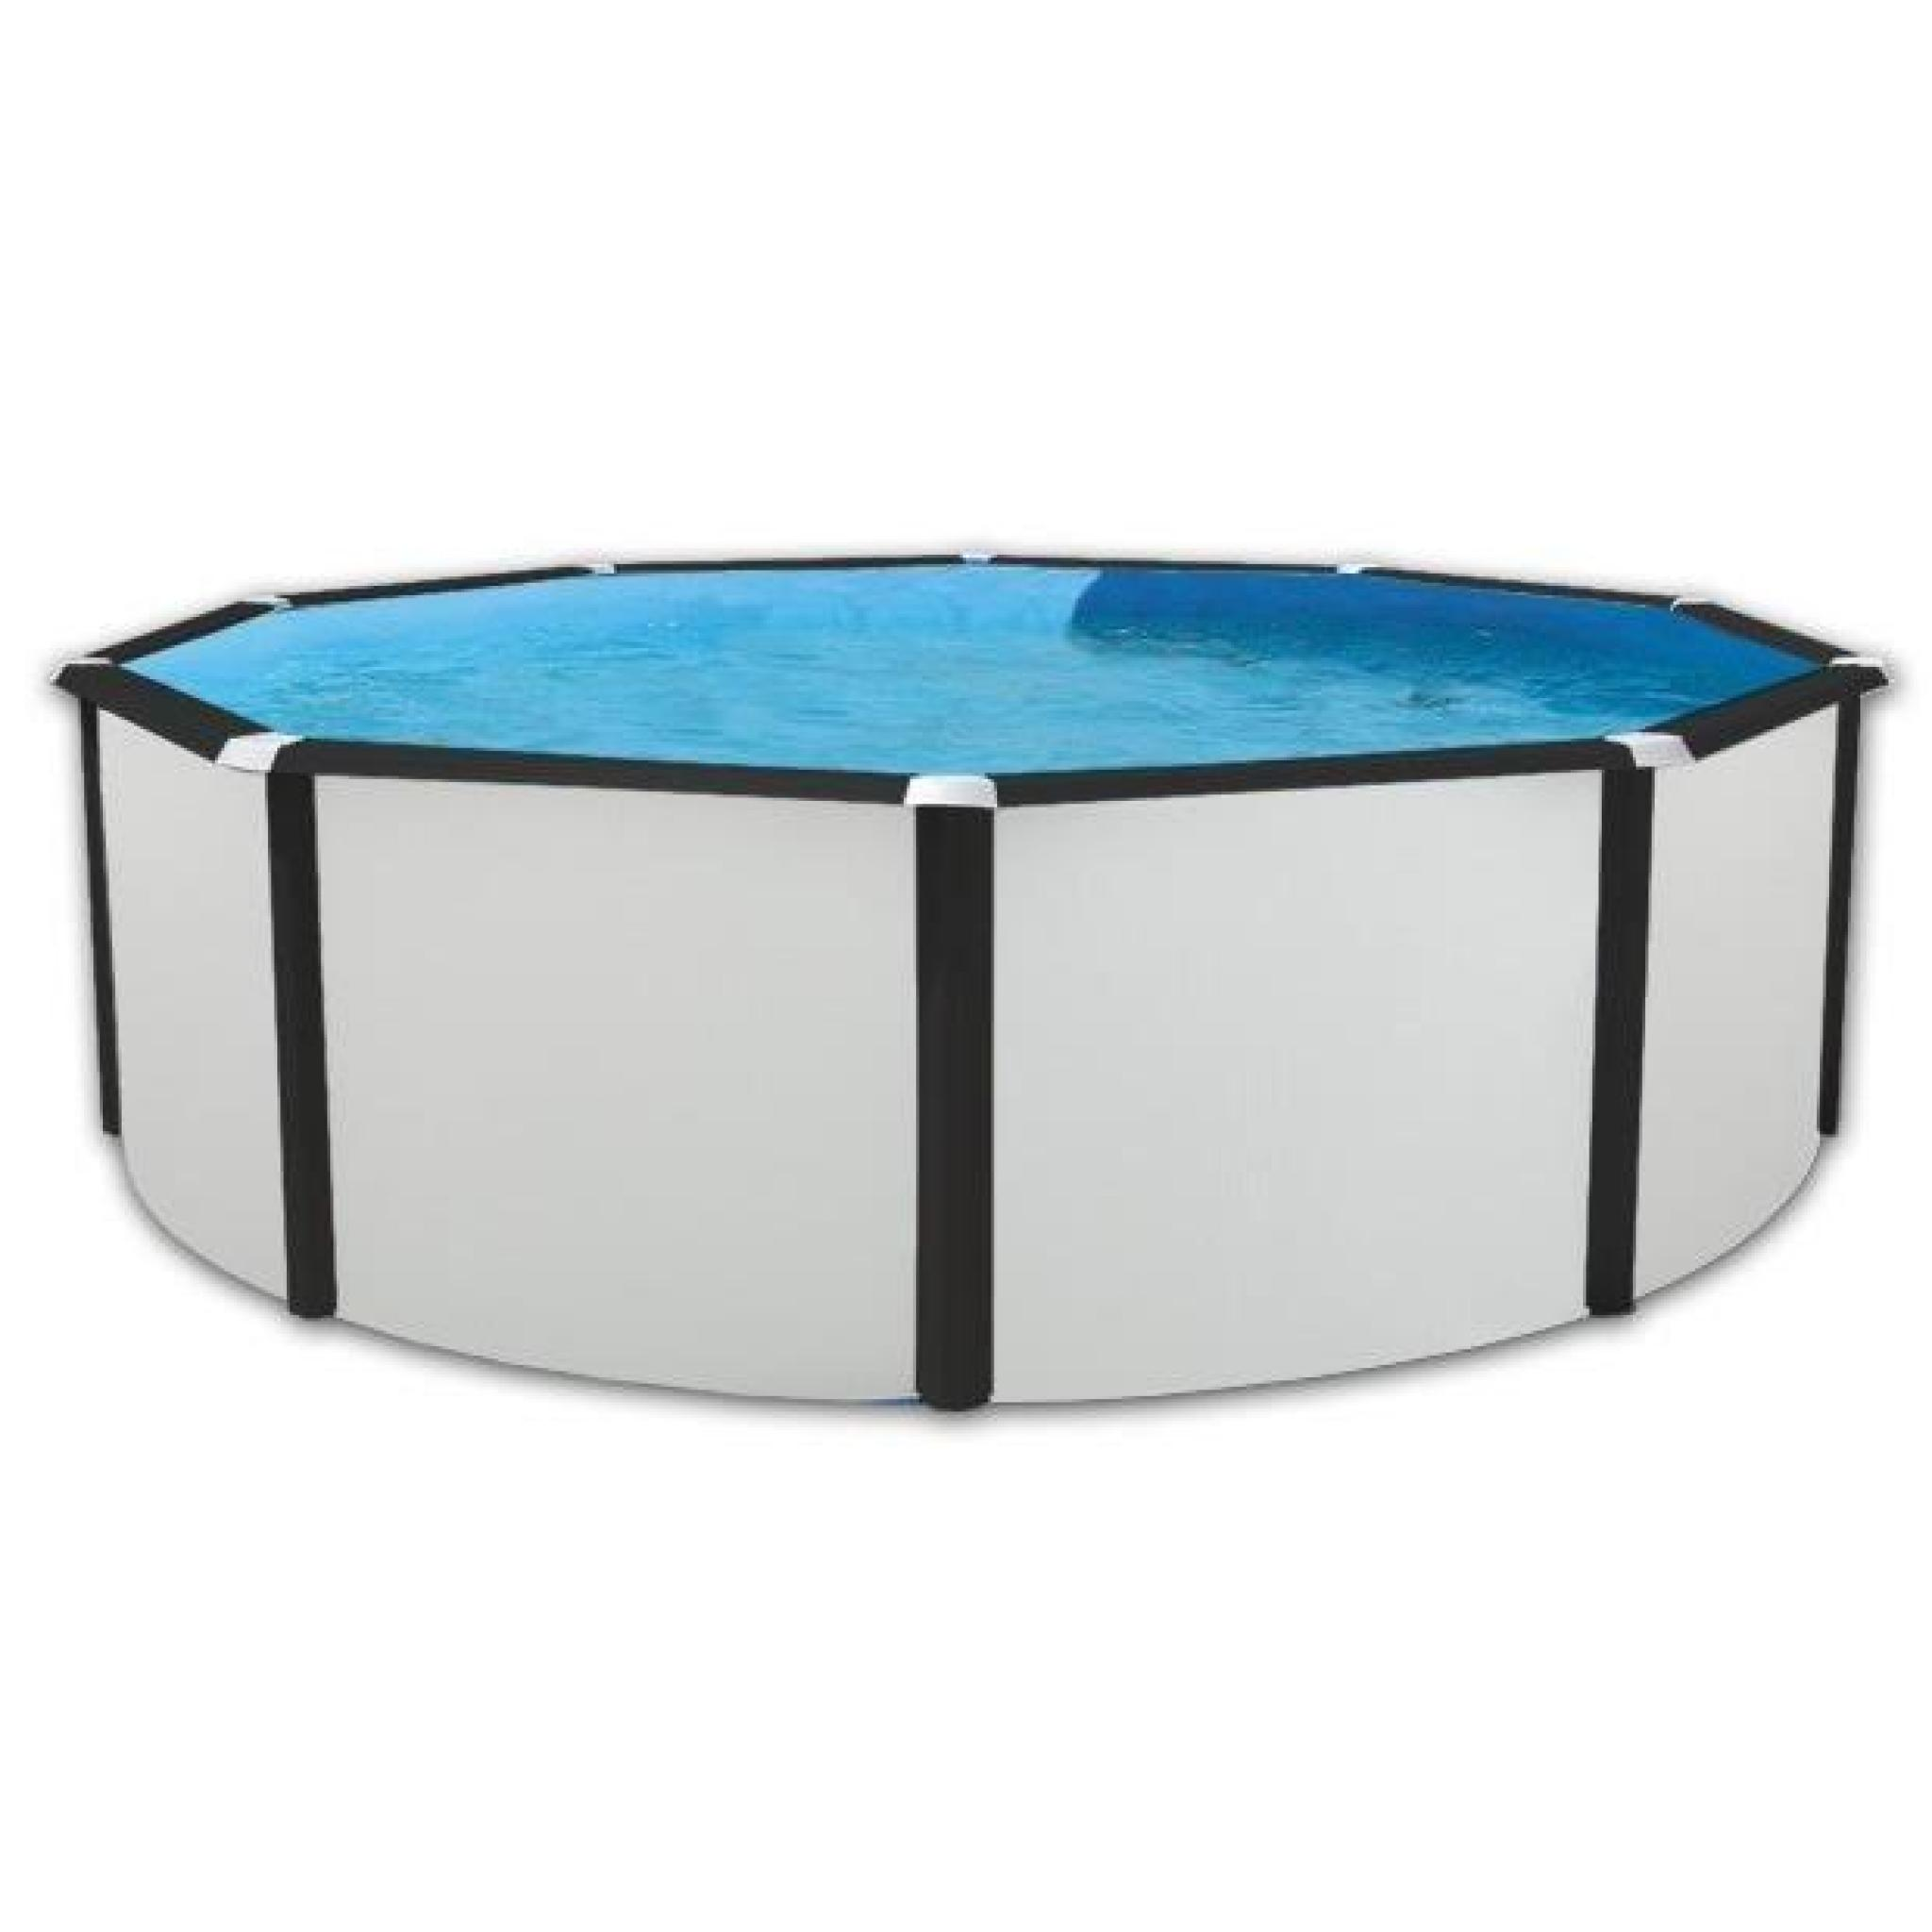 Elegance luna piscine ronde en acier 460x120cm achat - Piscine hors sol acier pas cher ...